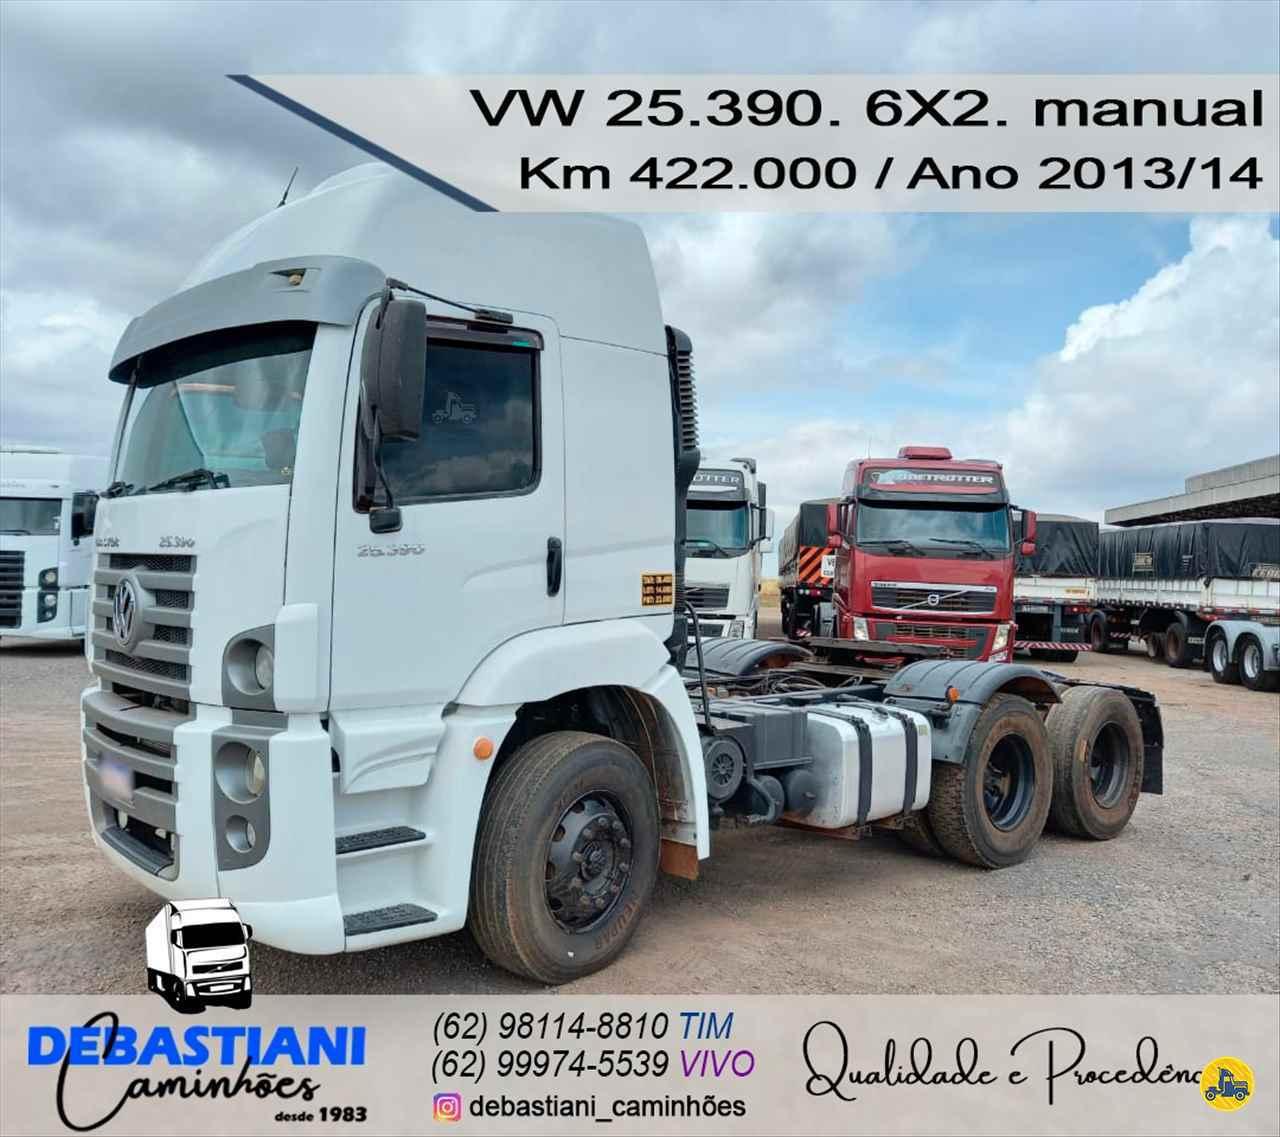 CAMINHAO VOLKSWAGEN VW 25390 Cavalo Mecânico Truck 6x2 Debastiani Caminhões ANAPOLIS GOIAS GO